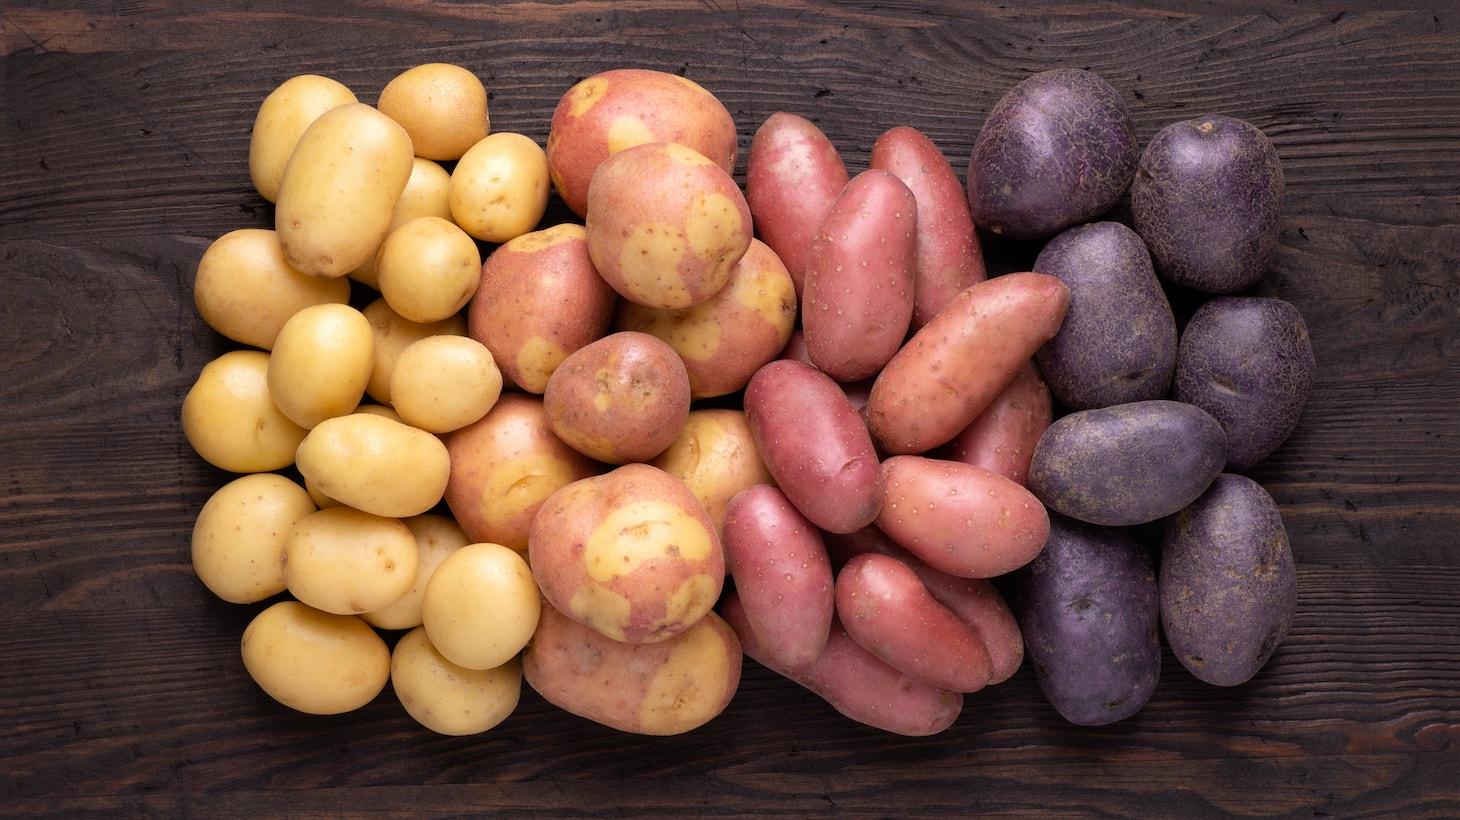 Kartoffeln kochen: So geht's richtig